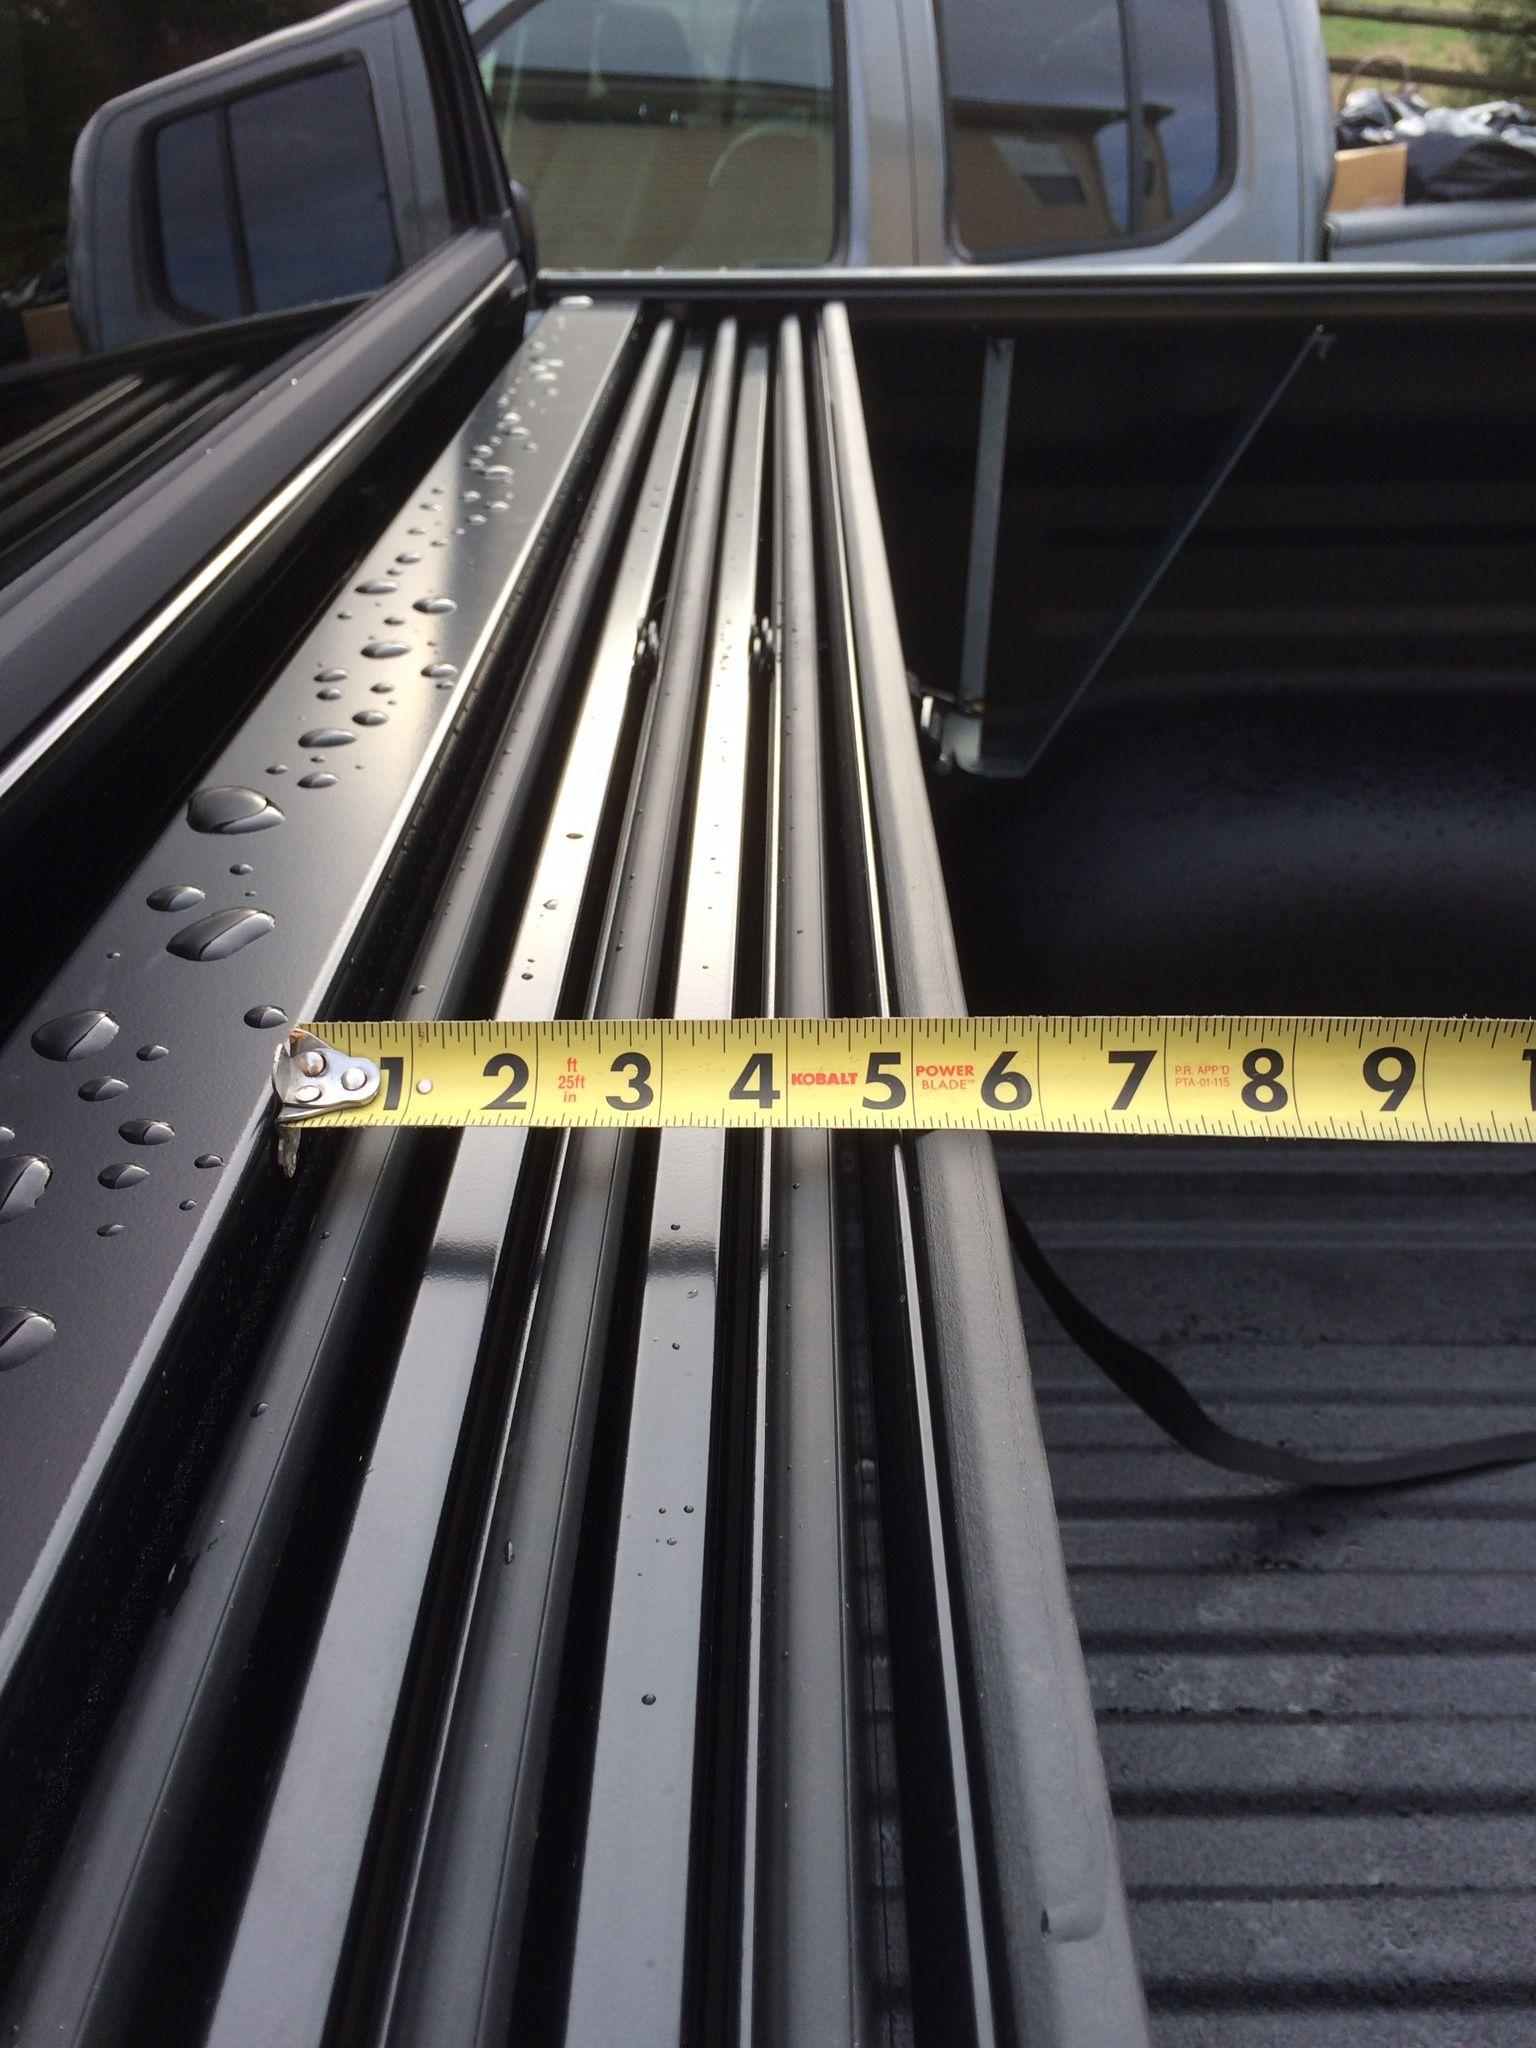 Peragon Photos Of The Peragon Retractable Truck Bed